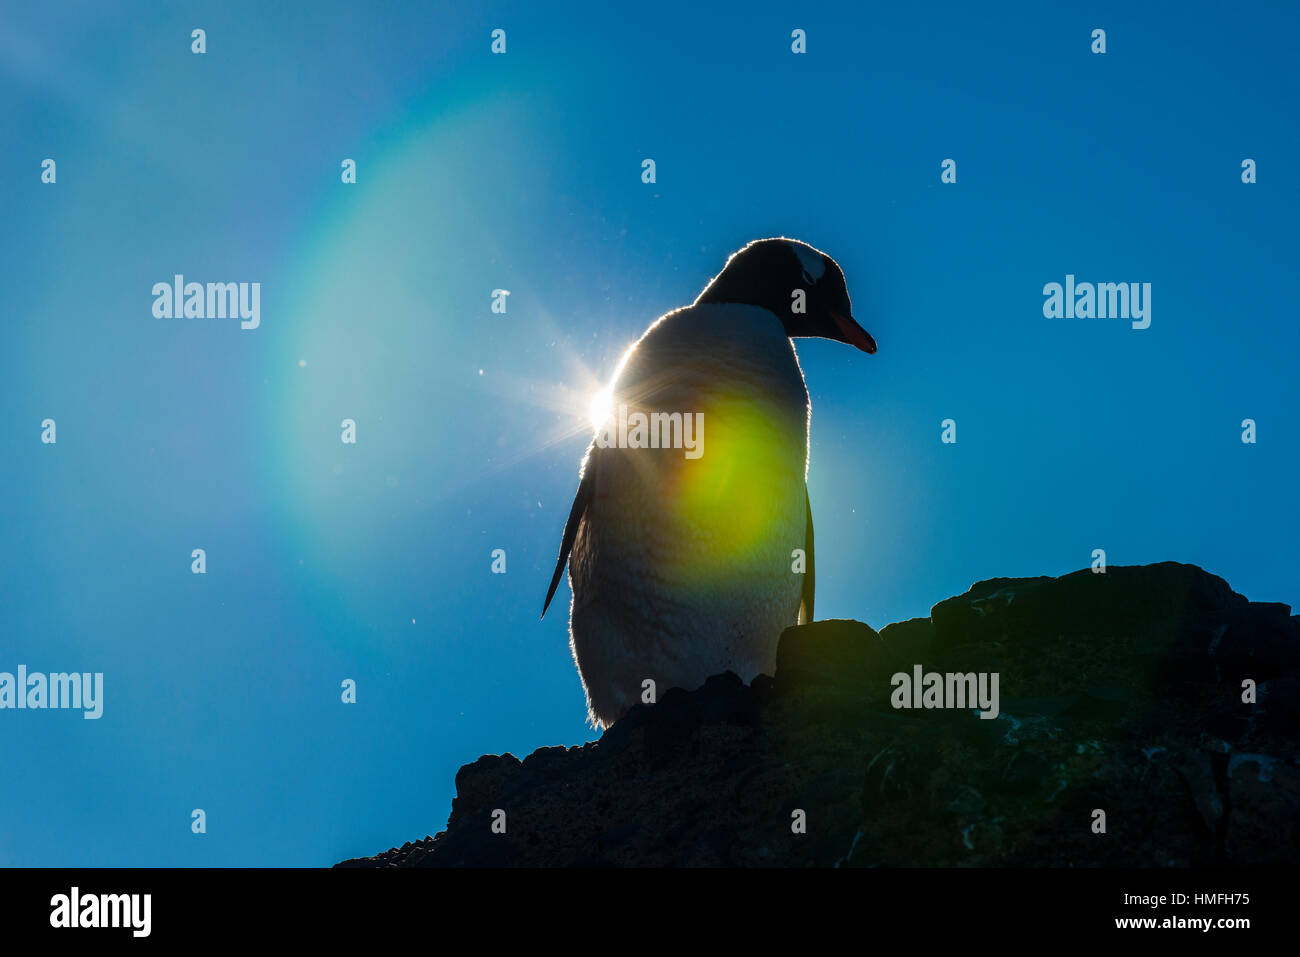 Pinguino Gentoo (Pygoscelis papua) in controluce, Marrone Bluff, Antartide, regioni polari Immagini Stock